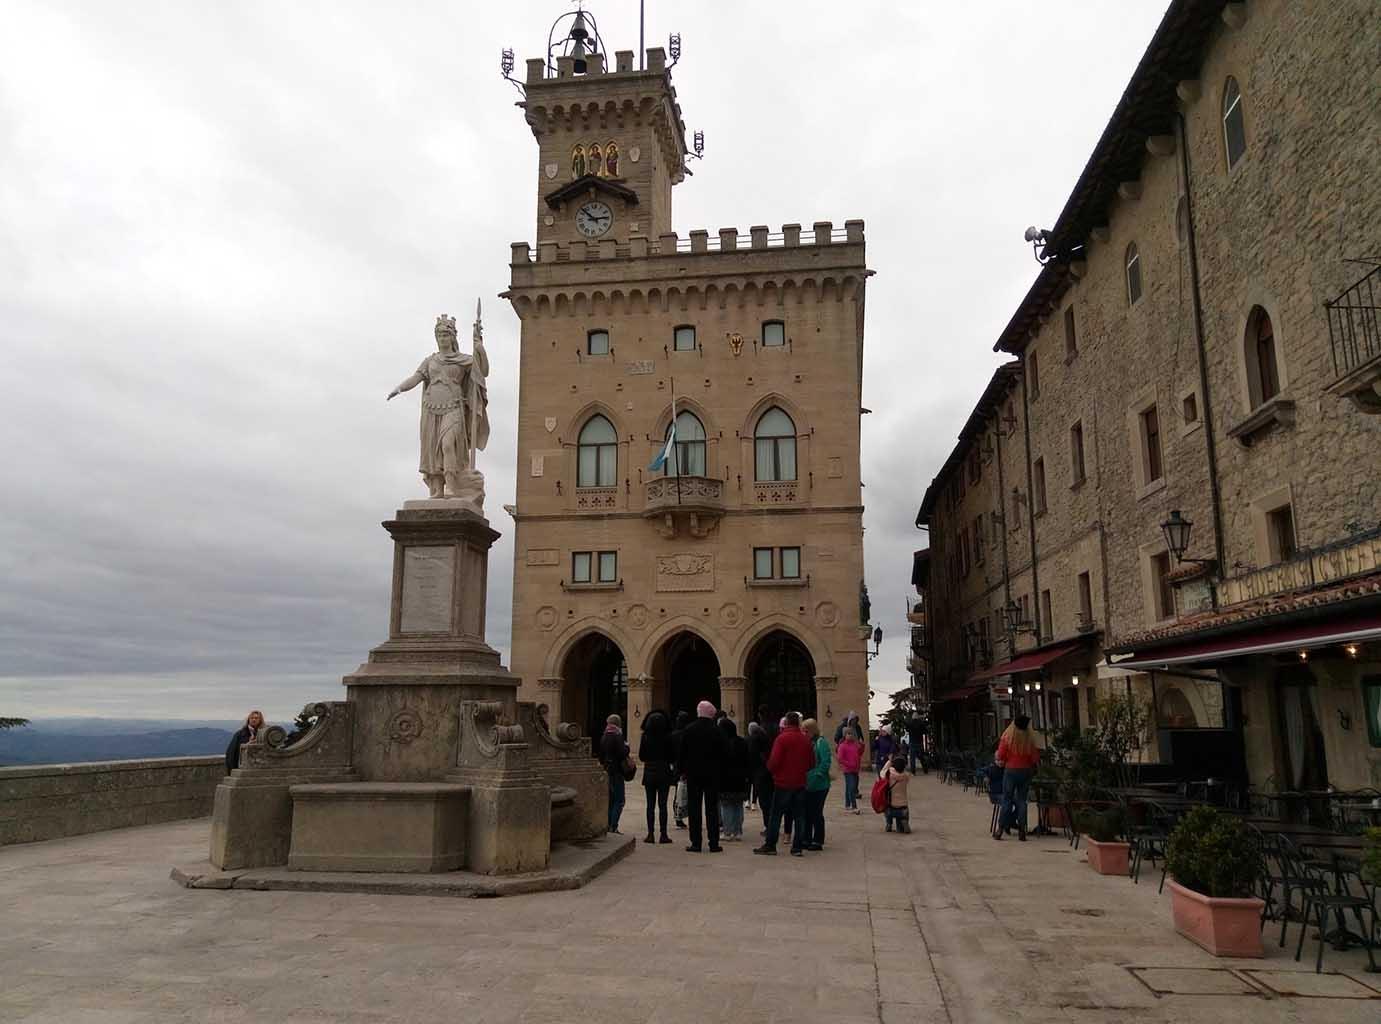 Сан Марино - 13 (San Marino sculpture)